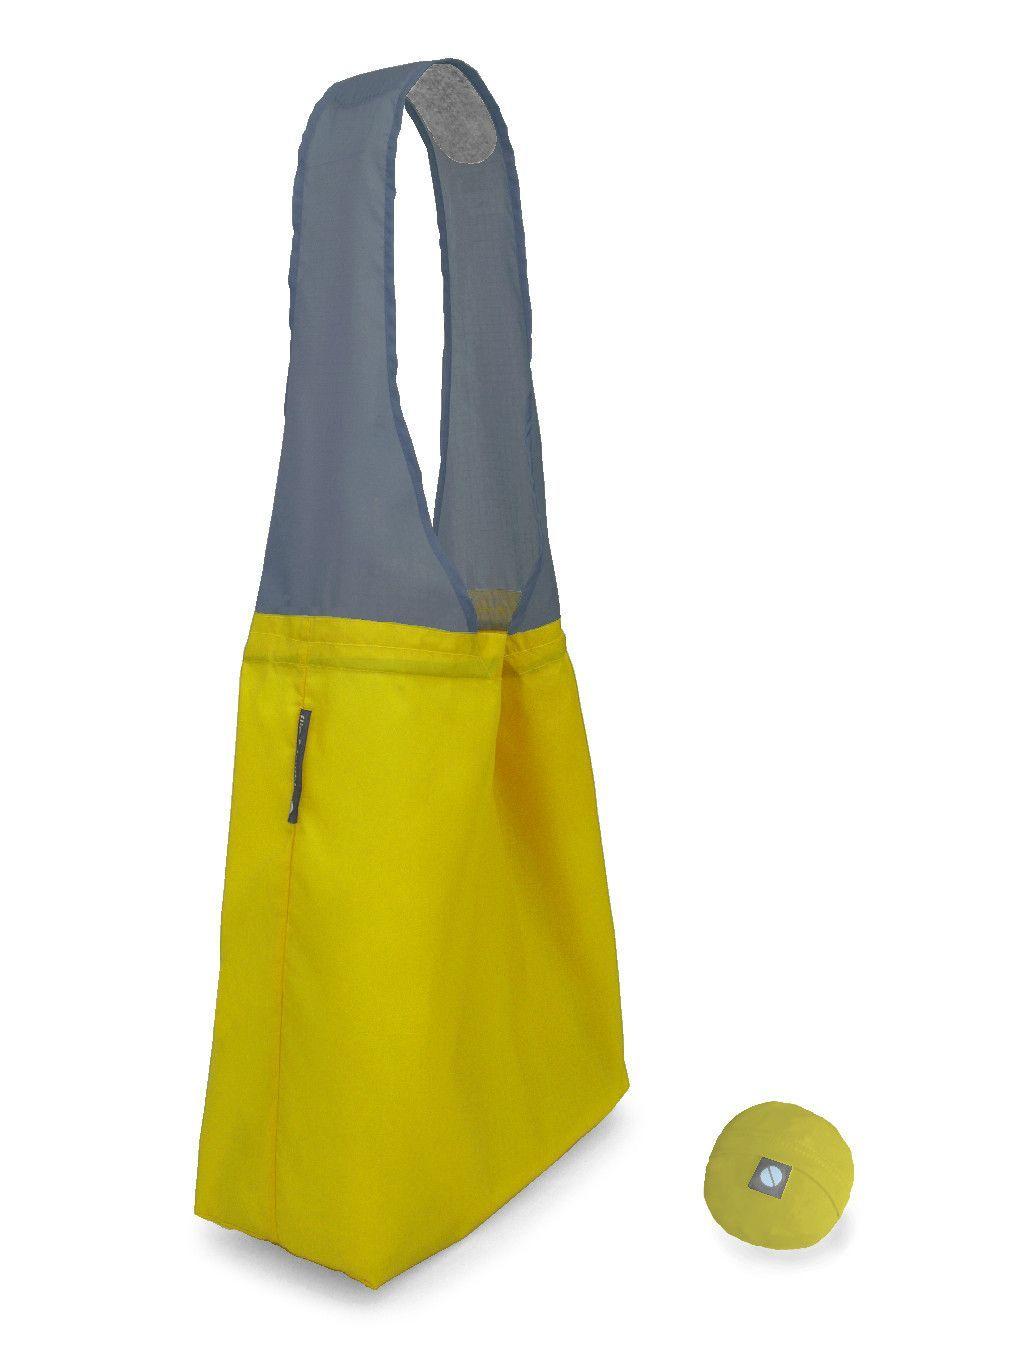 Flip & Tumble 24-7 Shopping Bag